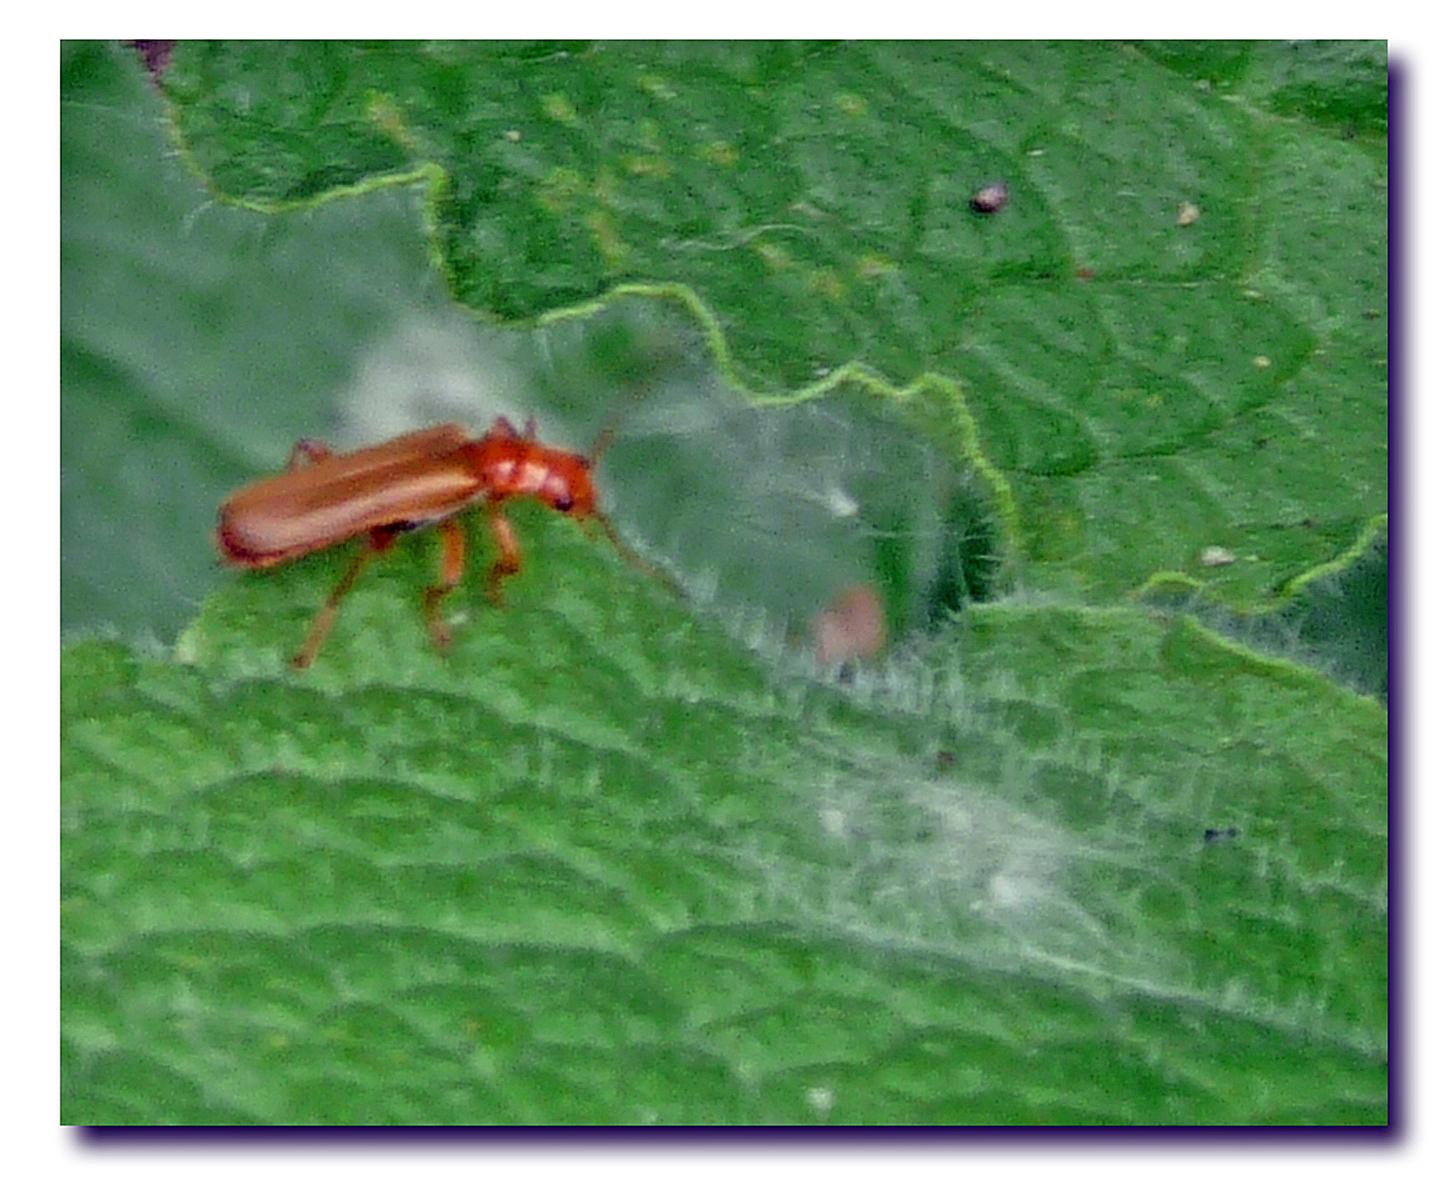 Green June Beetle By Wolfepaw On Deviantart Creatures